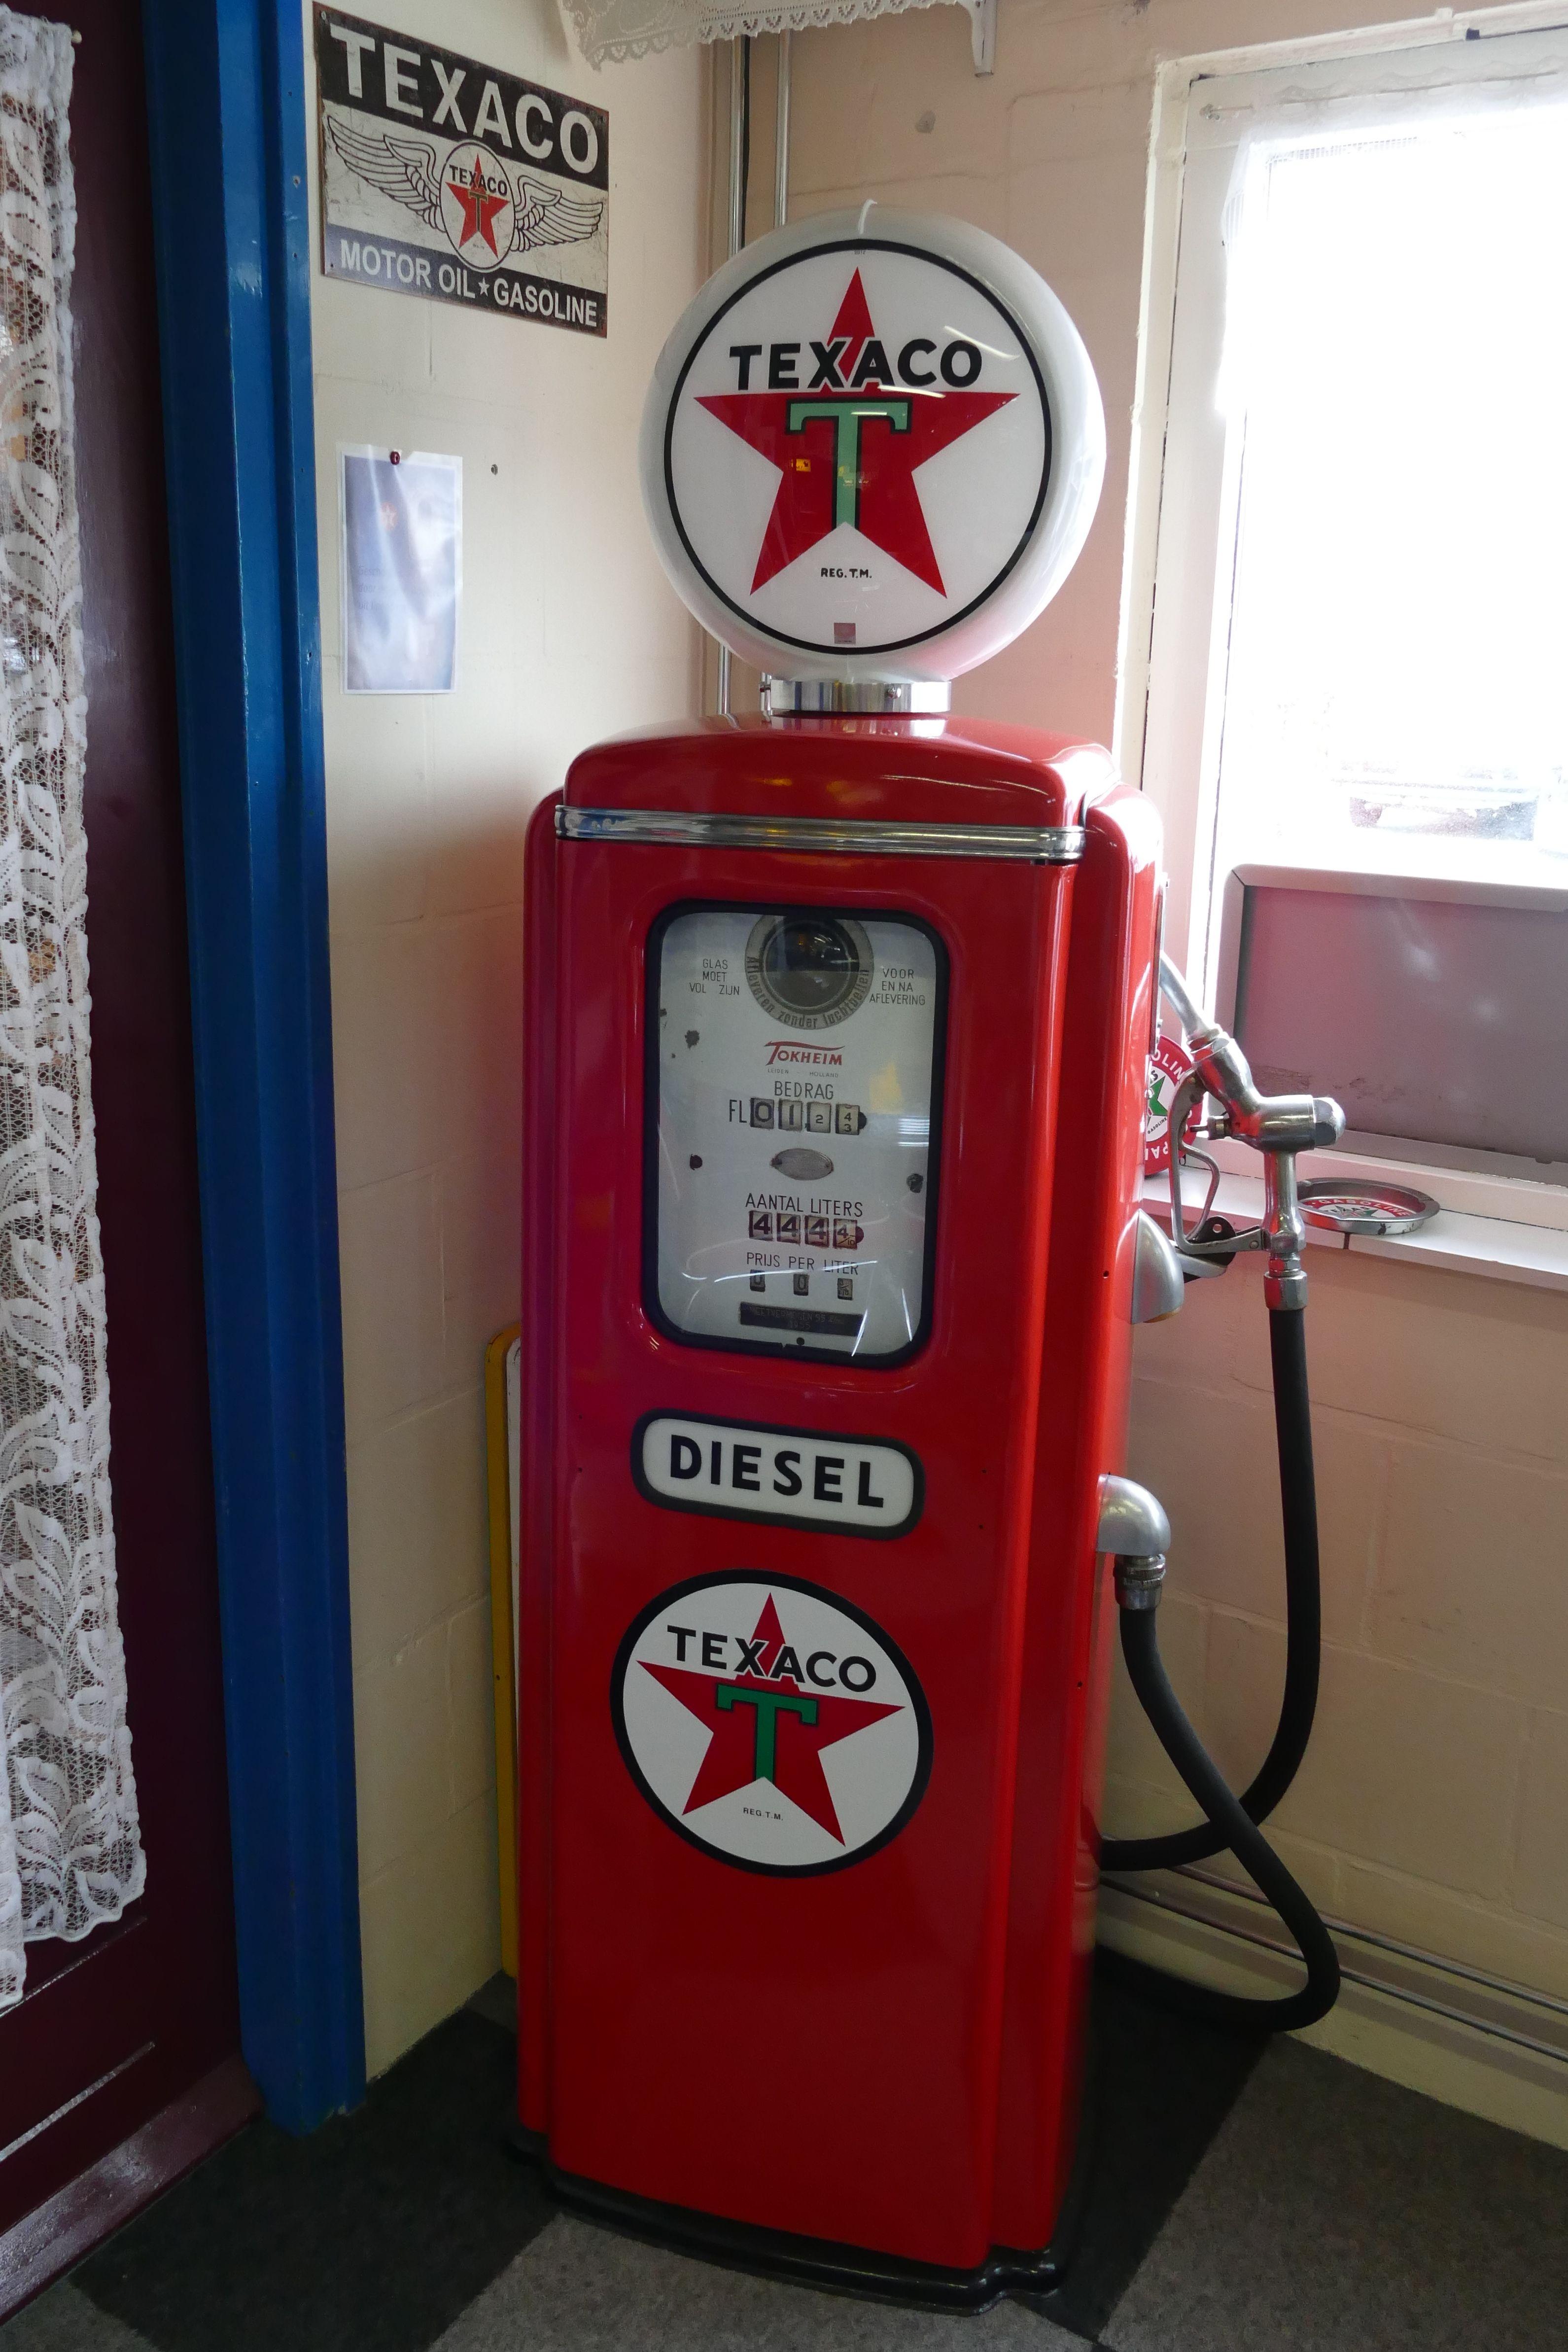 Modelo Em Escala 1:25 G Texaco Posto De Gasolina sinais de gás